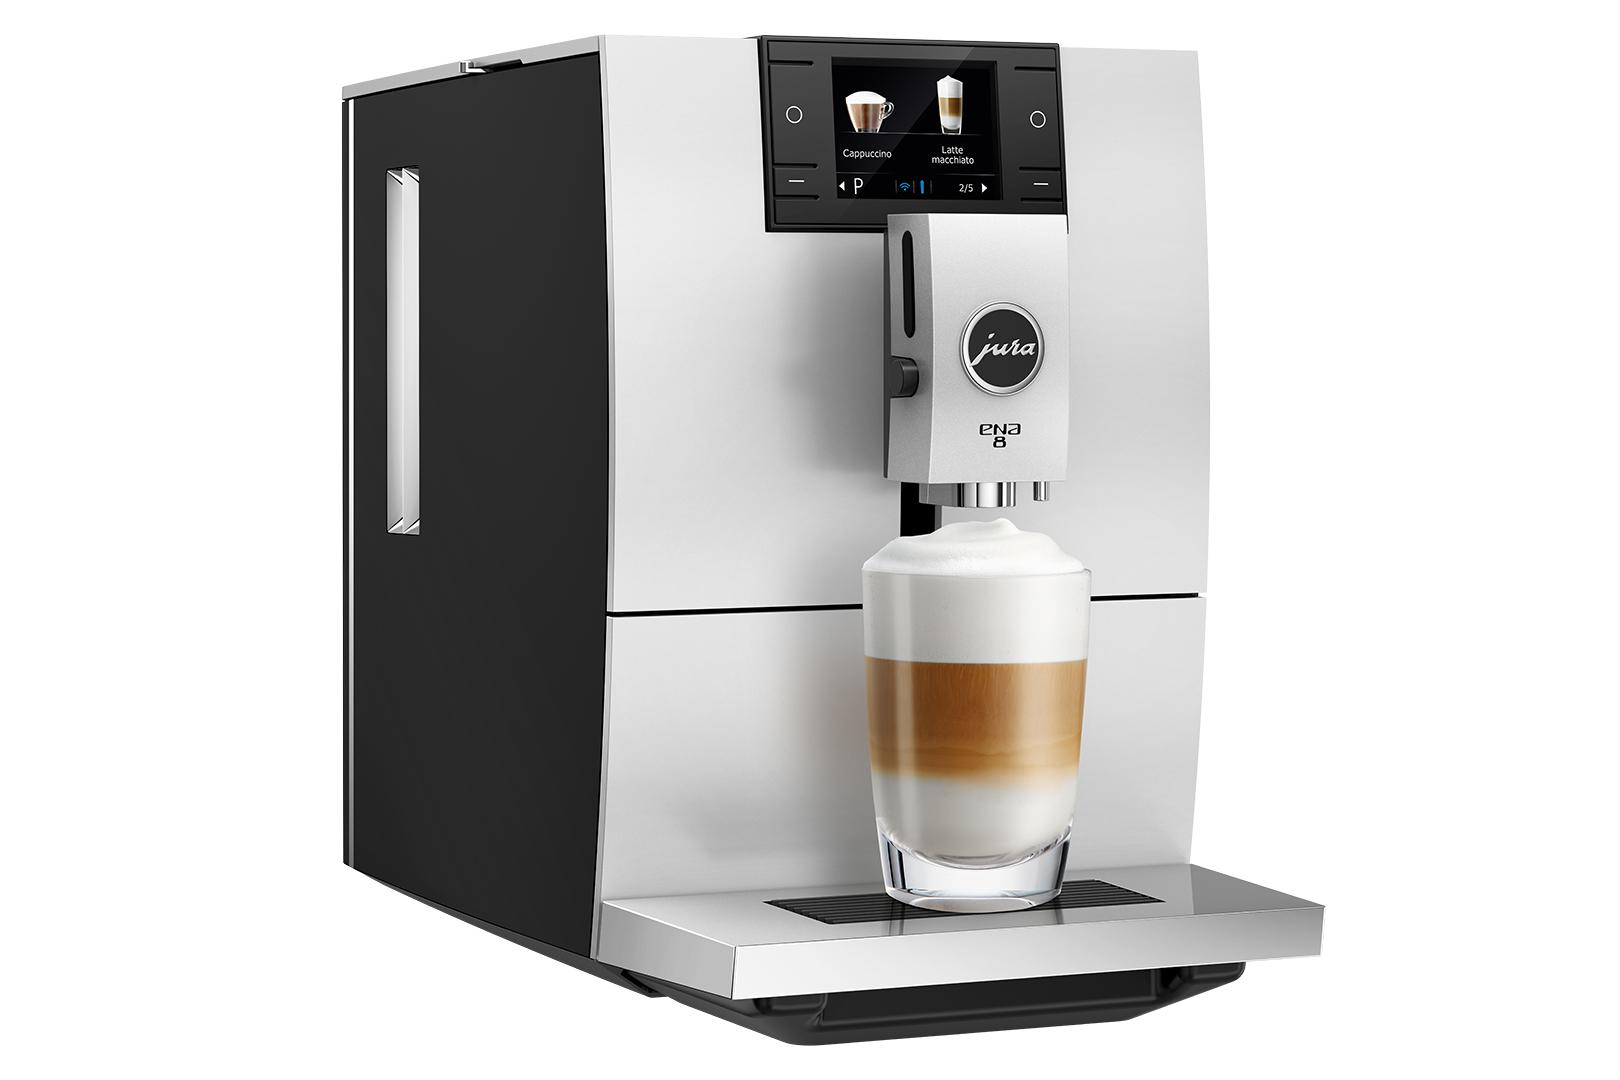 Espressor automat Jura ENA8, 15 bari, 1.1 l, 125g, rasnita AromaG3, 10 specialitati One Touch, afisaj color, Metropolitan Black+ cafea cadou